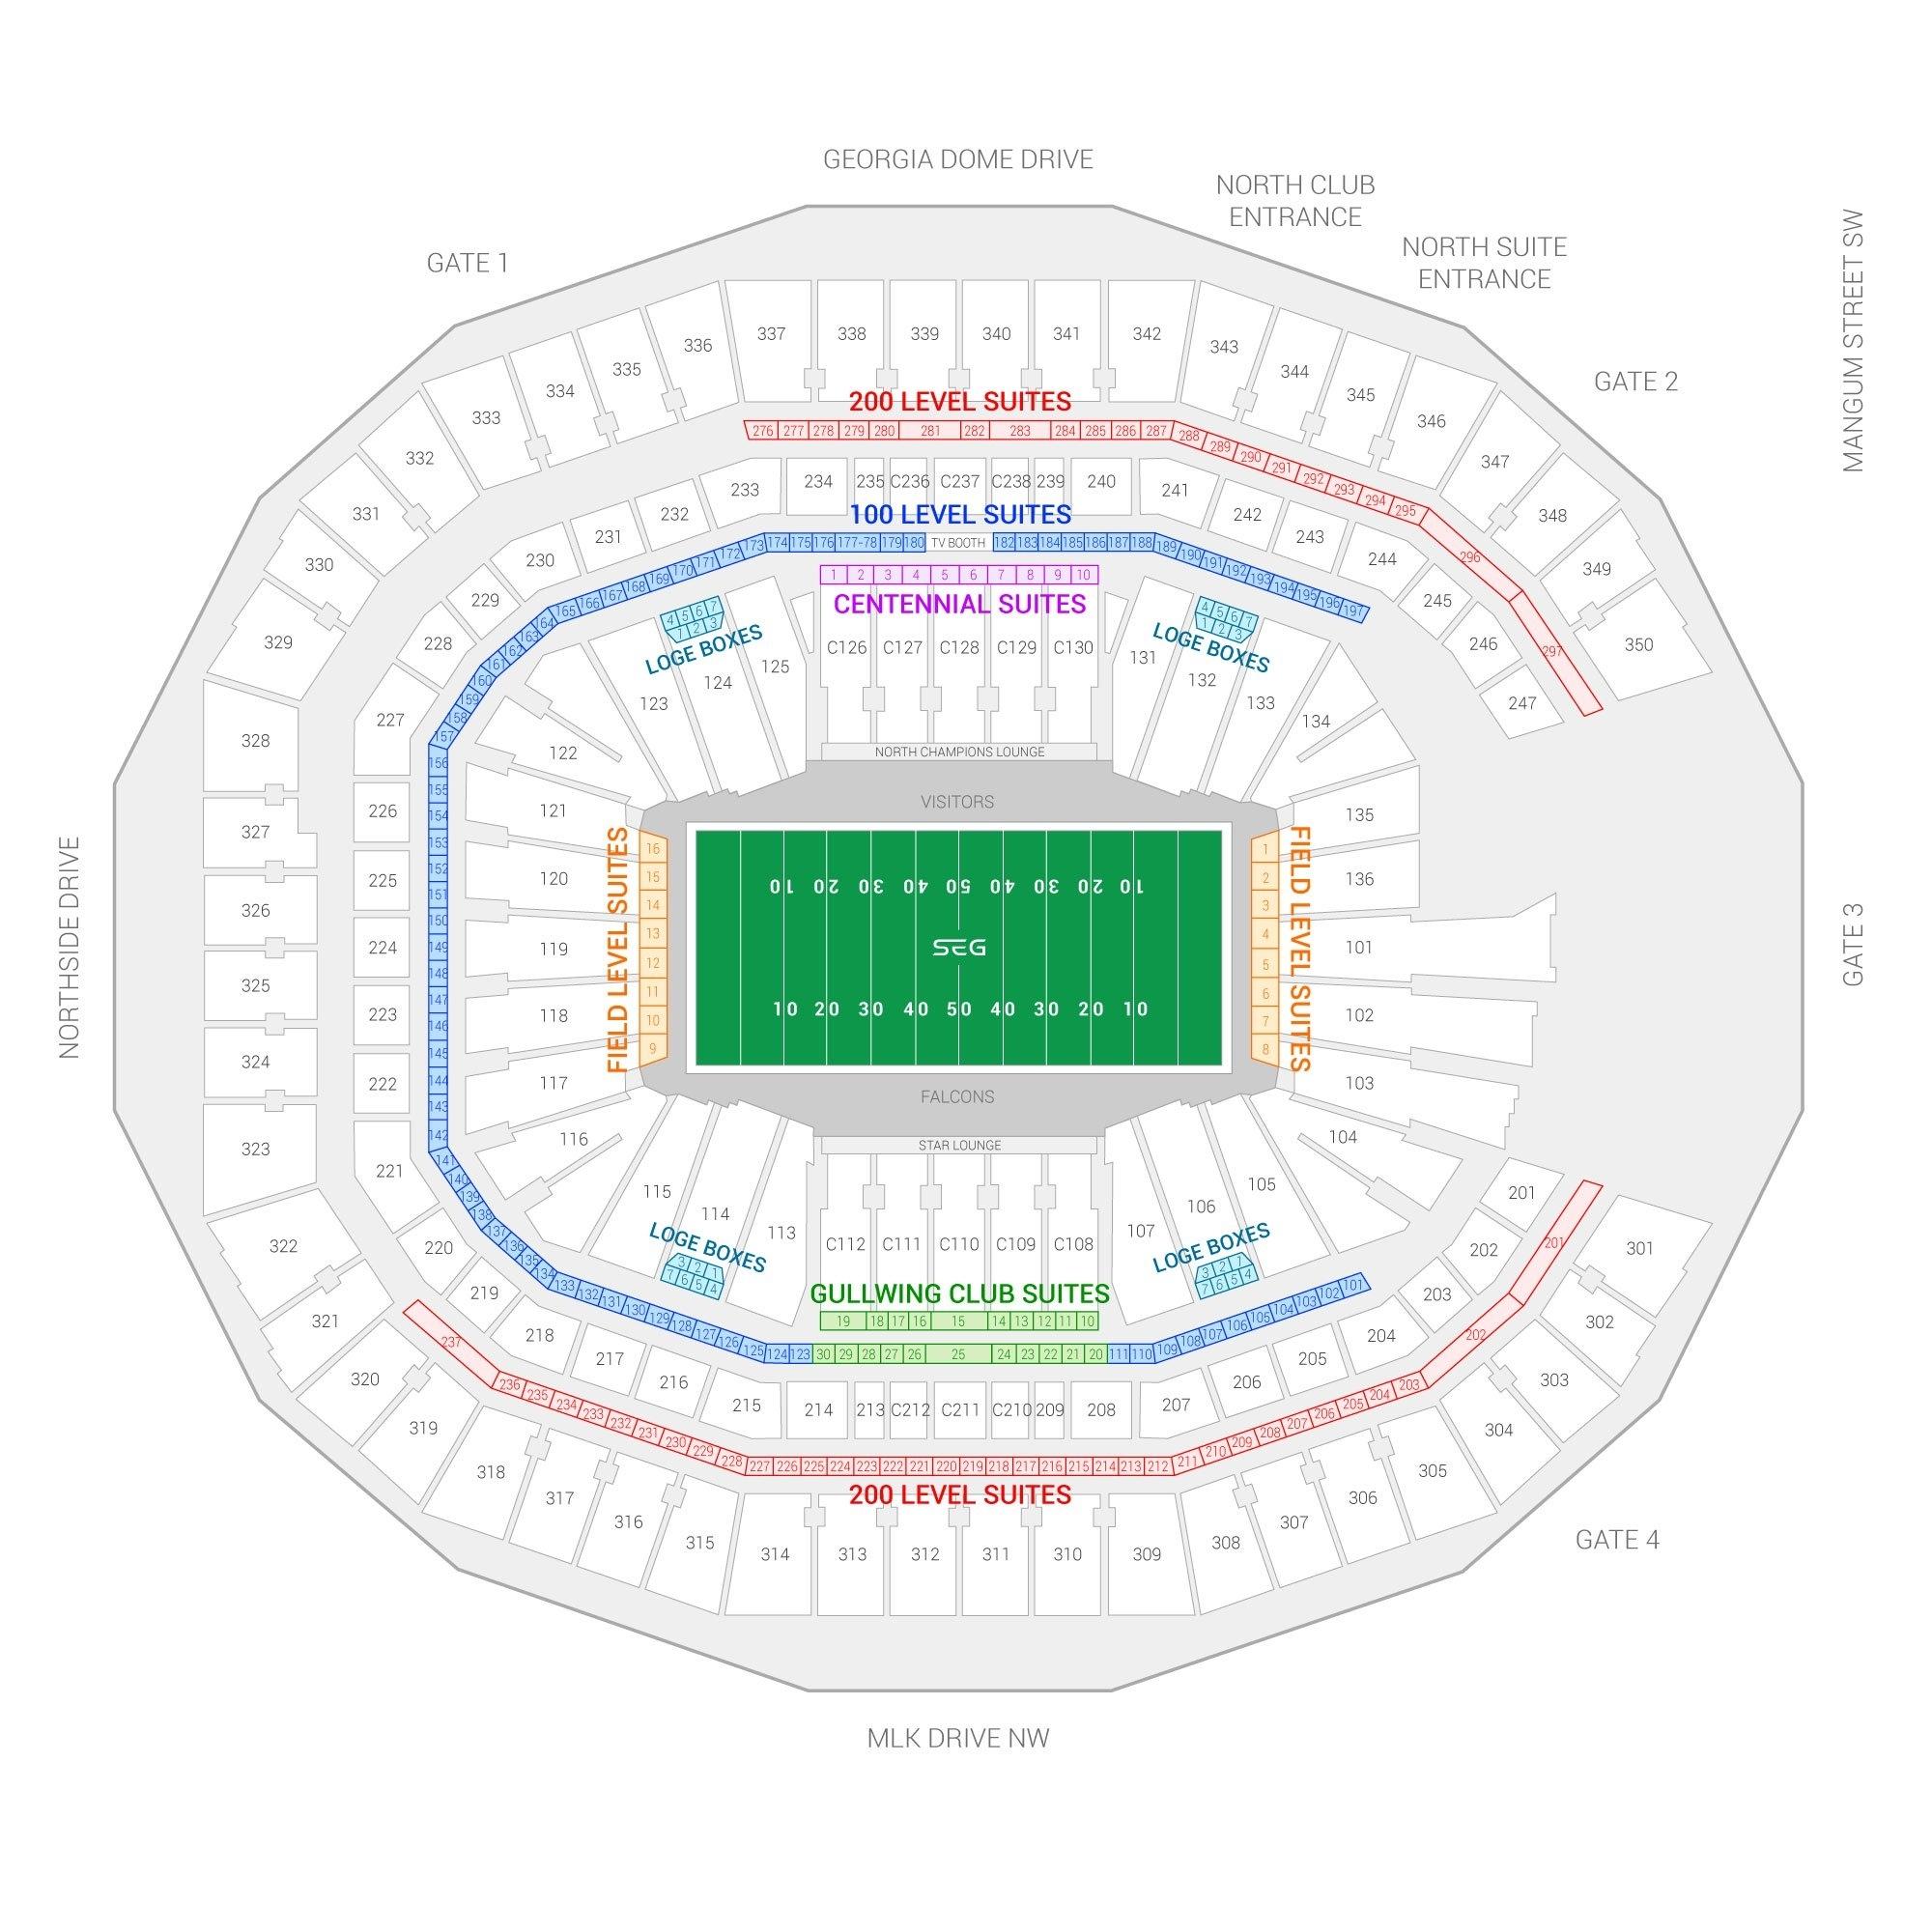 Atlanta Falcons Suite Rentals | Mercedes-Benz Stadium with regard to Super Bowl 2019 Seating Chart